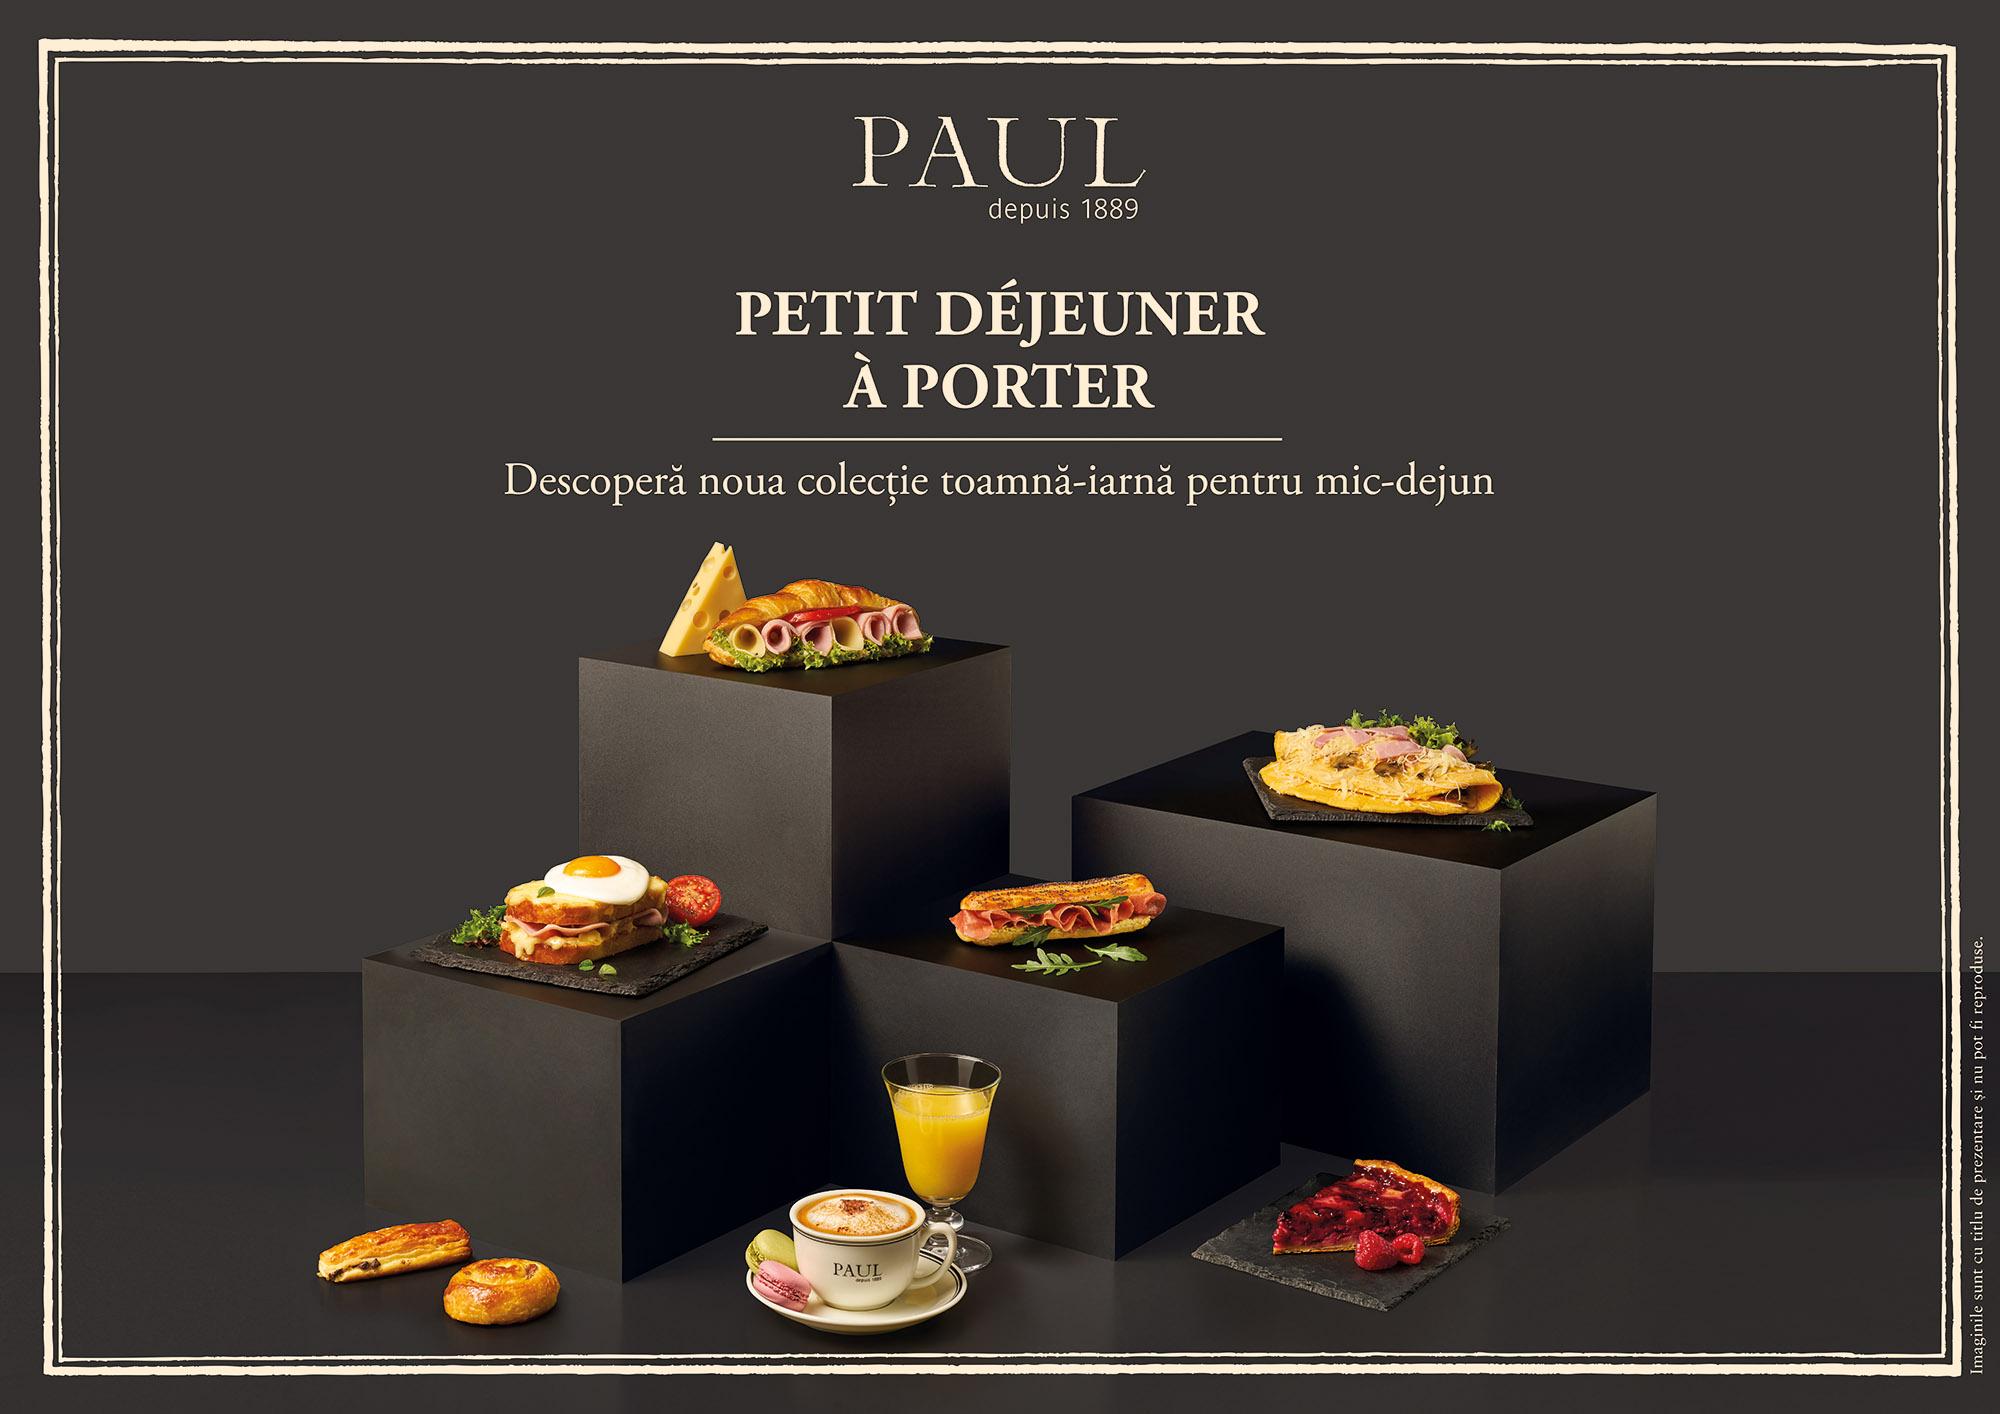 Brutaria Paul_Petit Dejeuner a porter